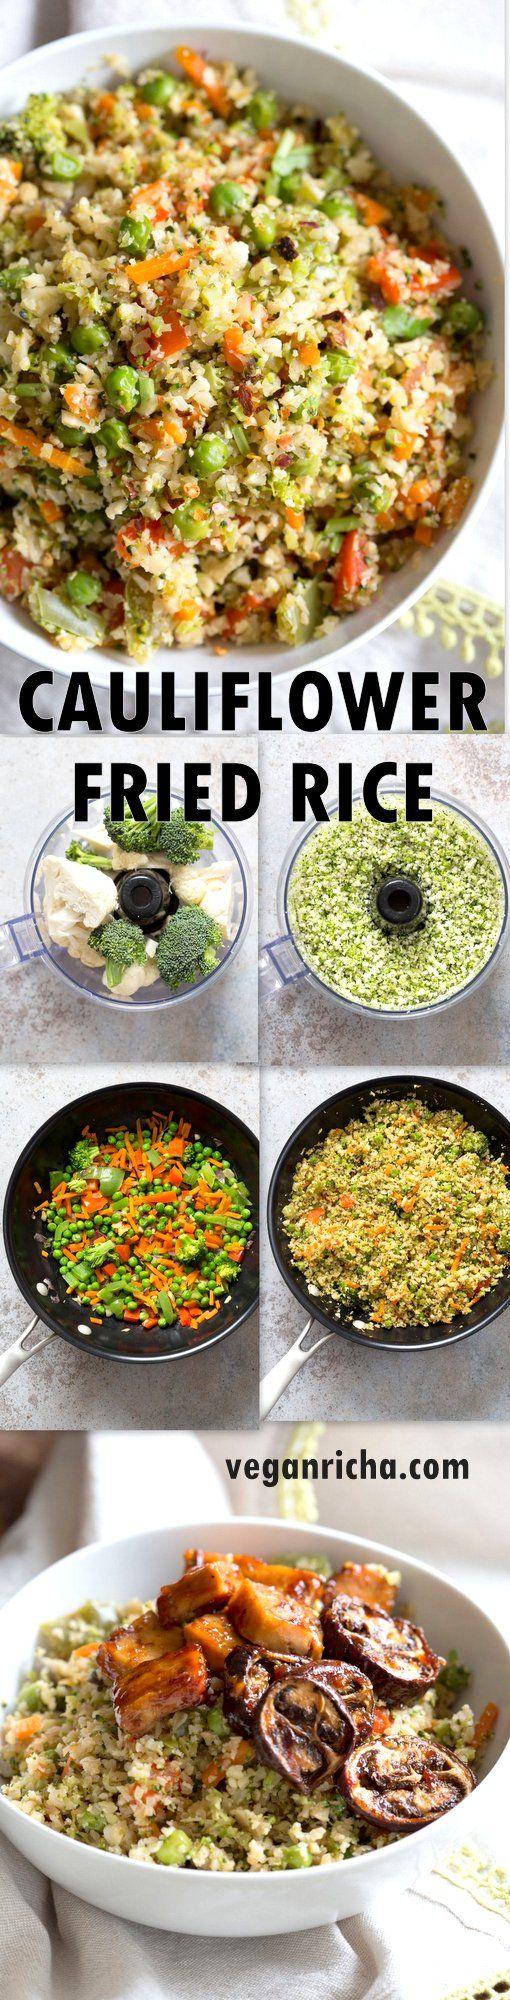 Vegan Cauliflower Fried Rice - 1 Pot Cauliflower Fried Rice. Easy 1 Pot Fried Rice. No grains, low carb. So fluffy and so good. |